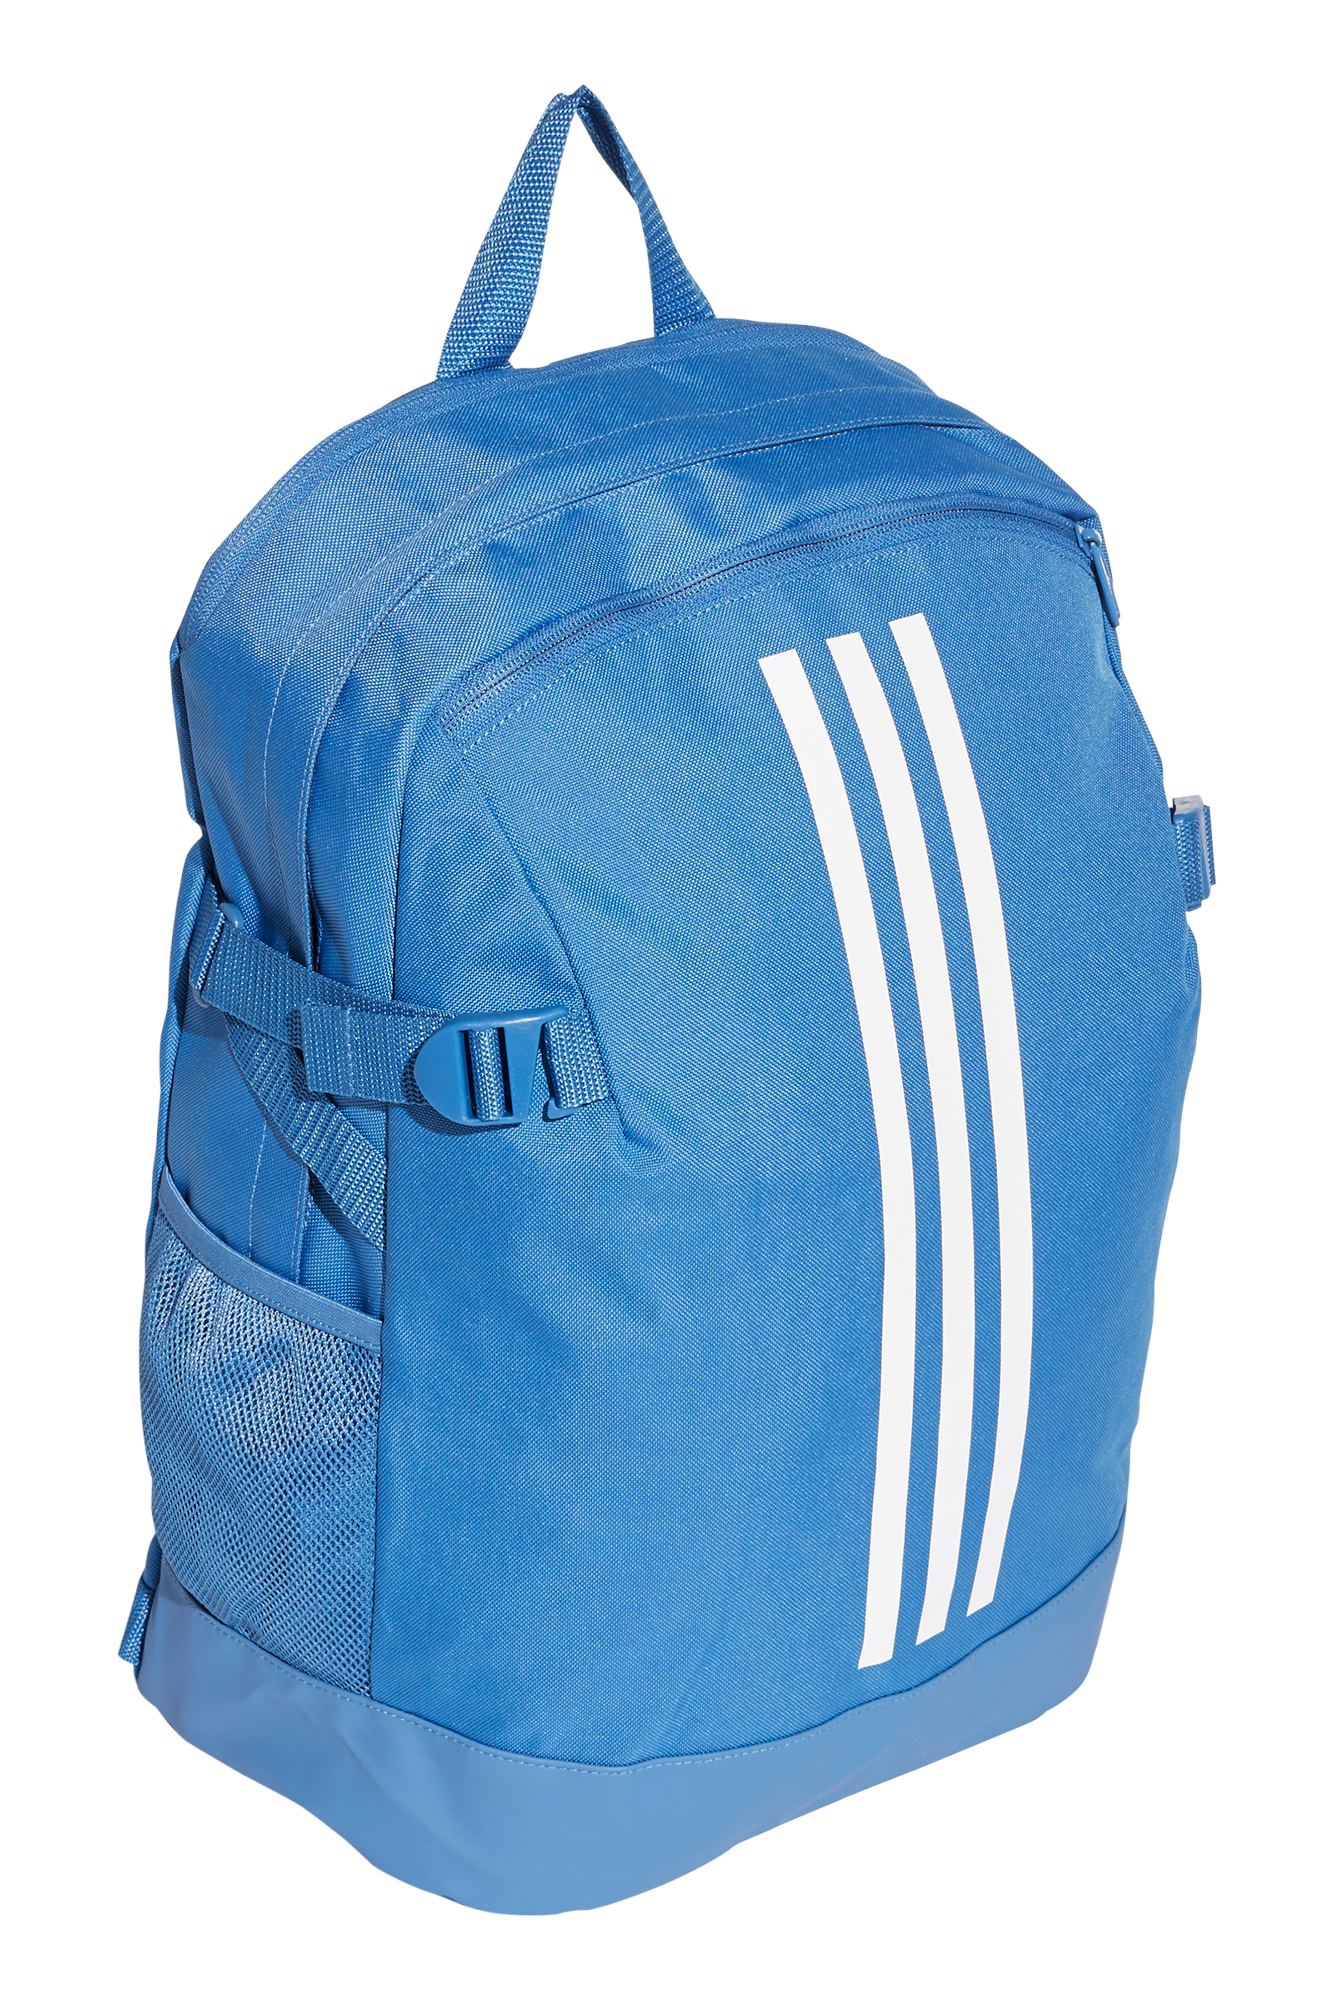 10f020f9a480d Plecak adidas 3-Stripes Power Medium - DM7684   Plecaki   Akcesoria ...